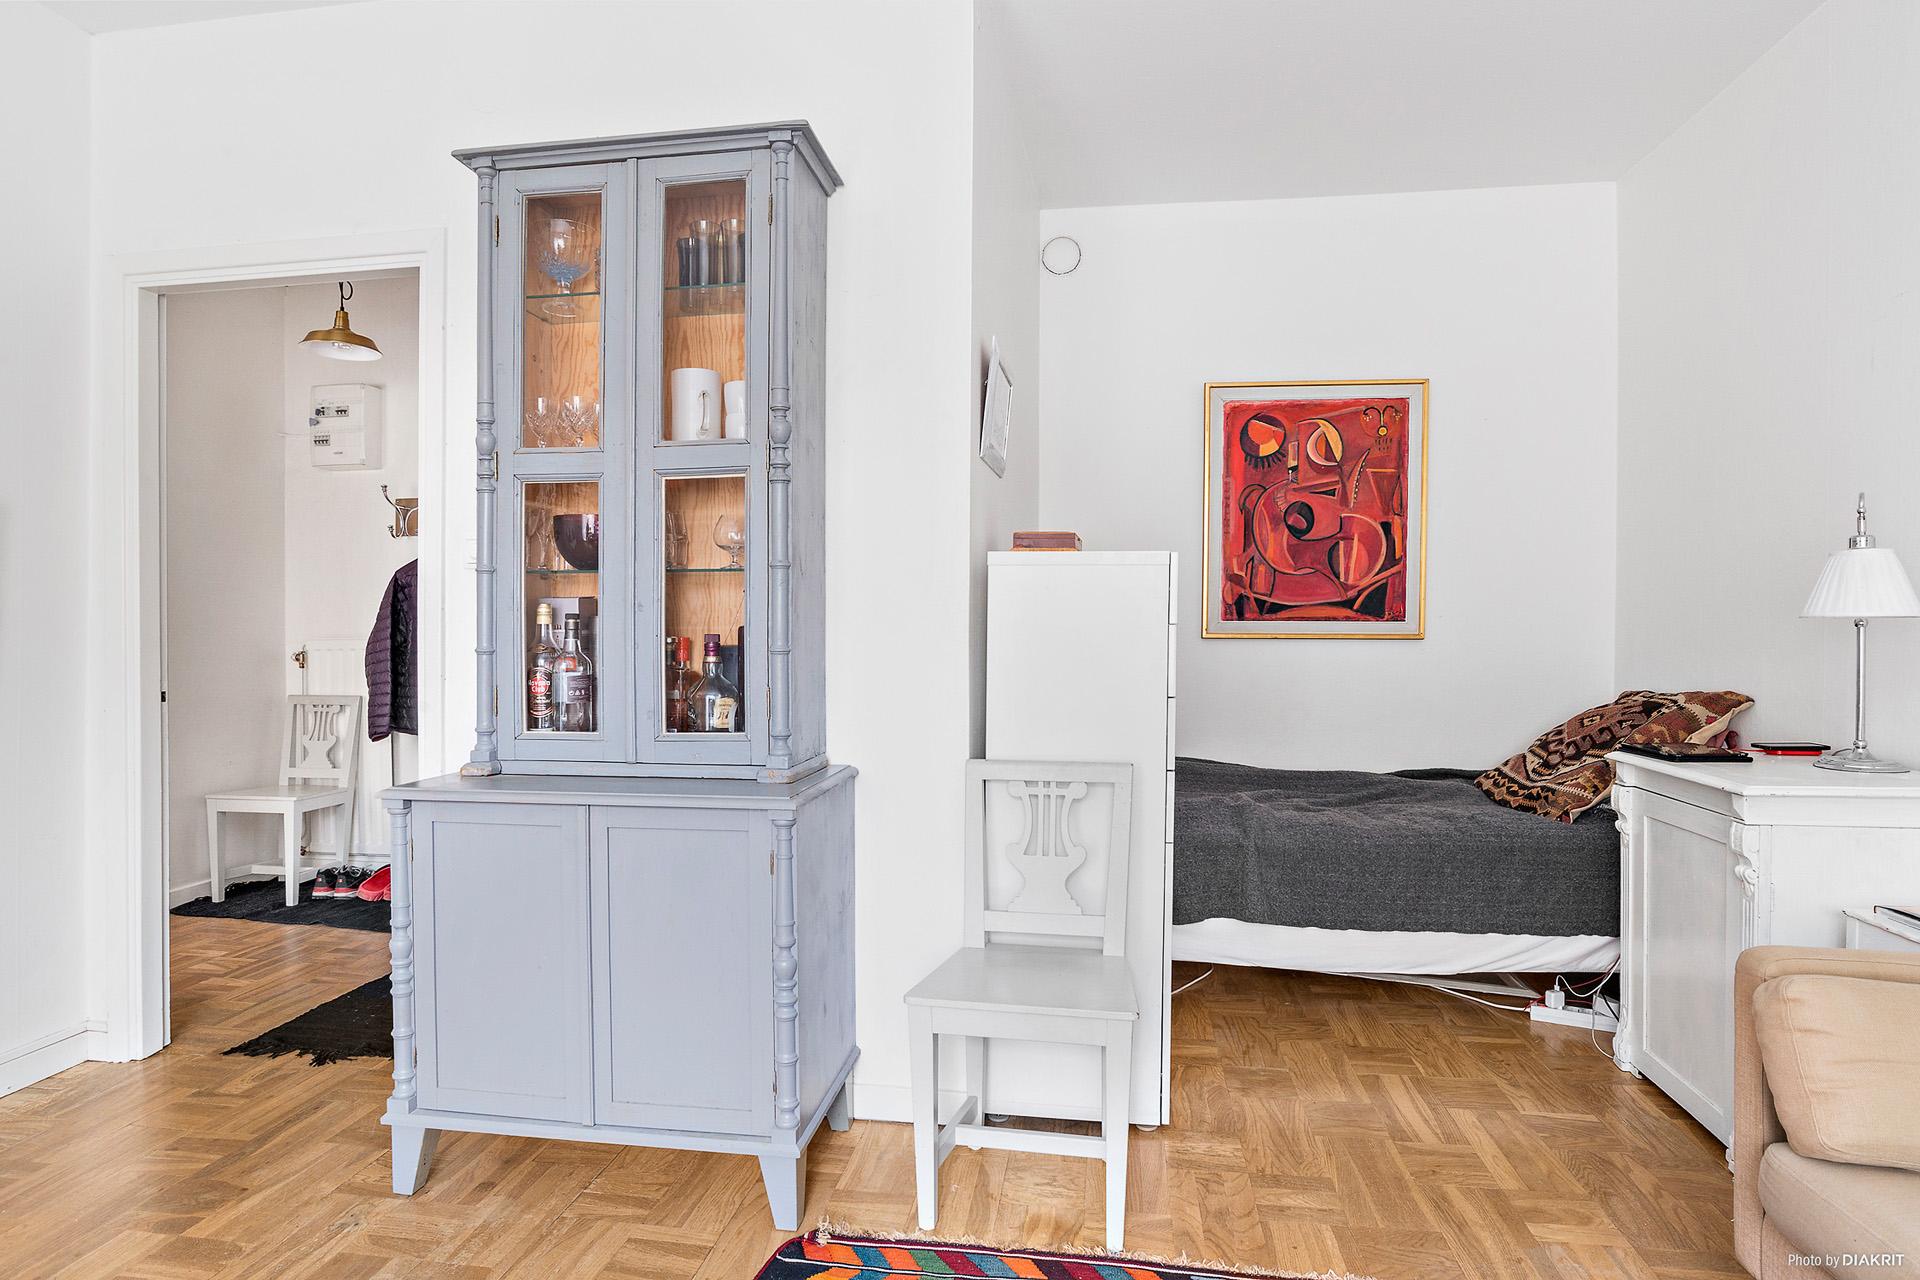 Sovalkov i rummet